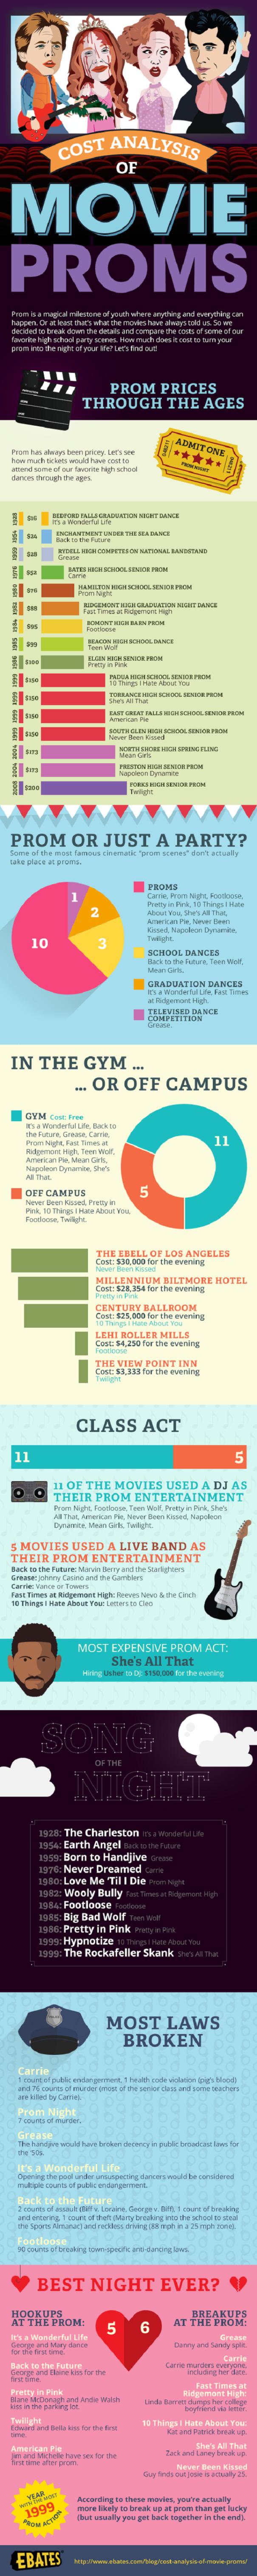 Movie Proms Cost Analysis